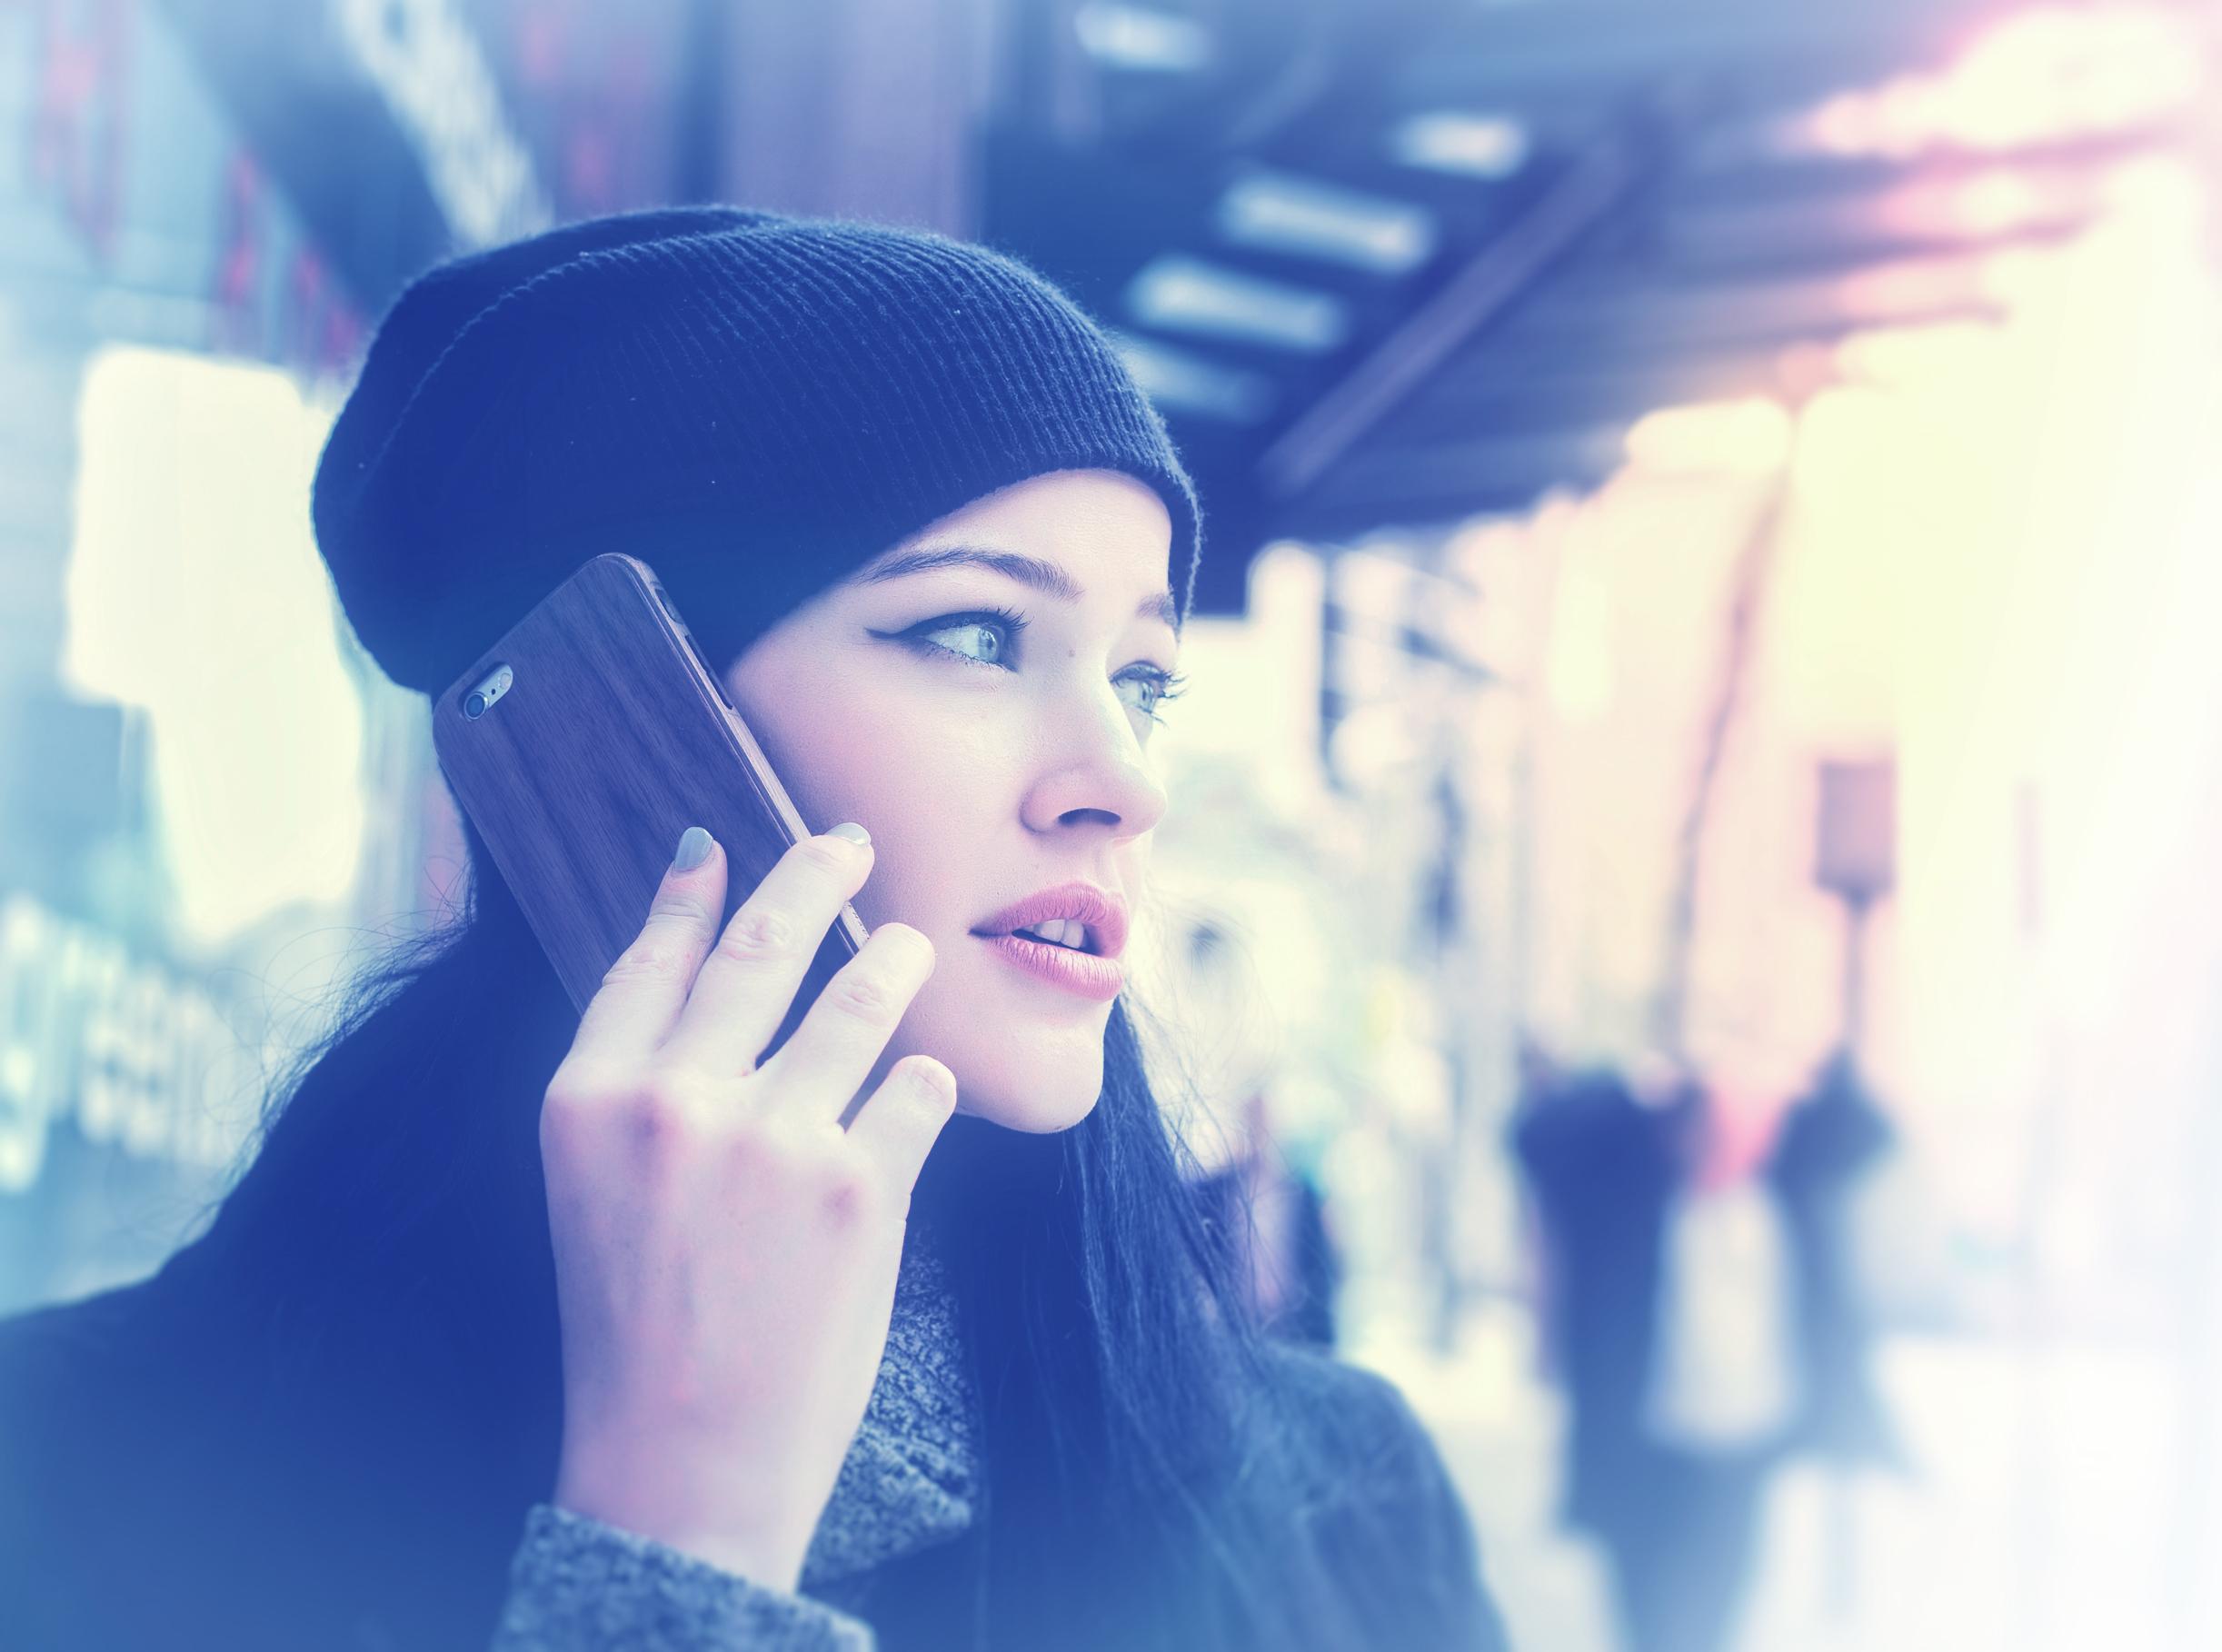 Woman Talking Through Smartphone, Adult, Street, Teenager, Teen, HQ Photo